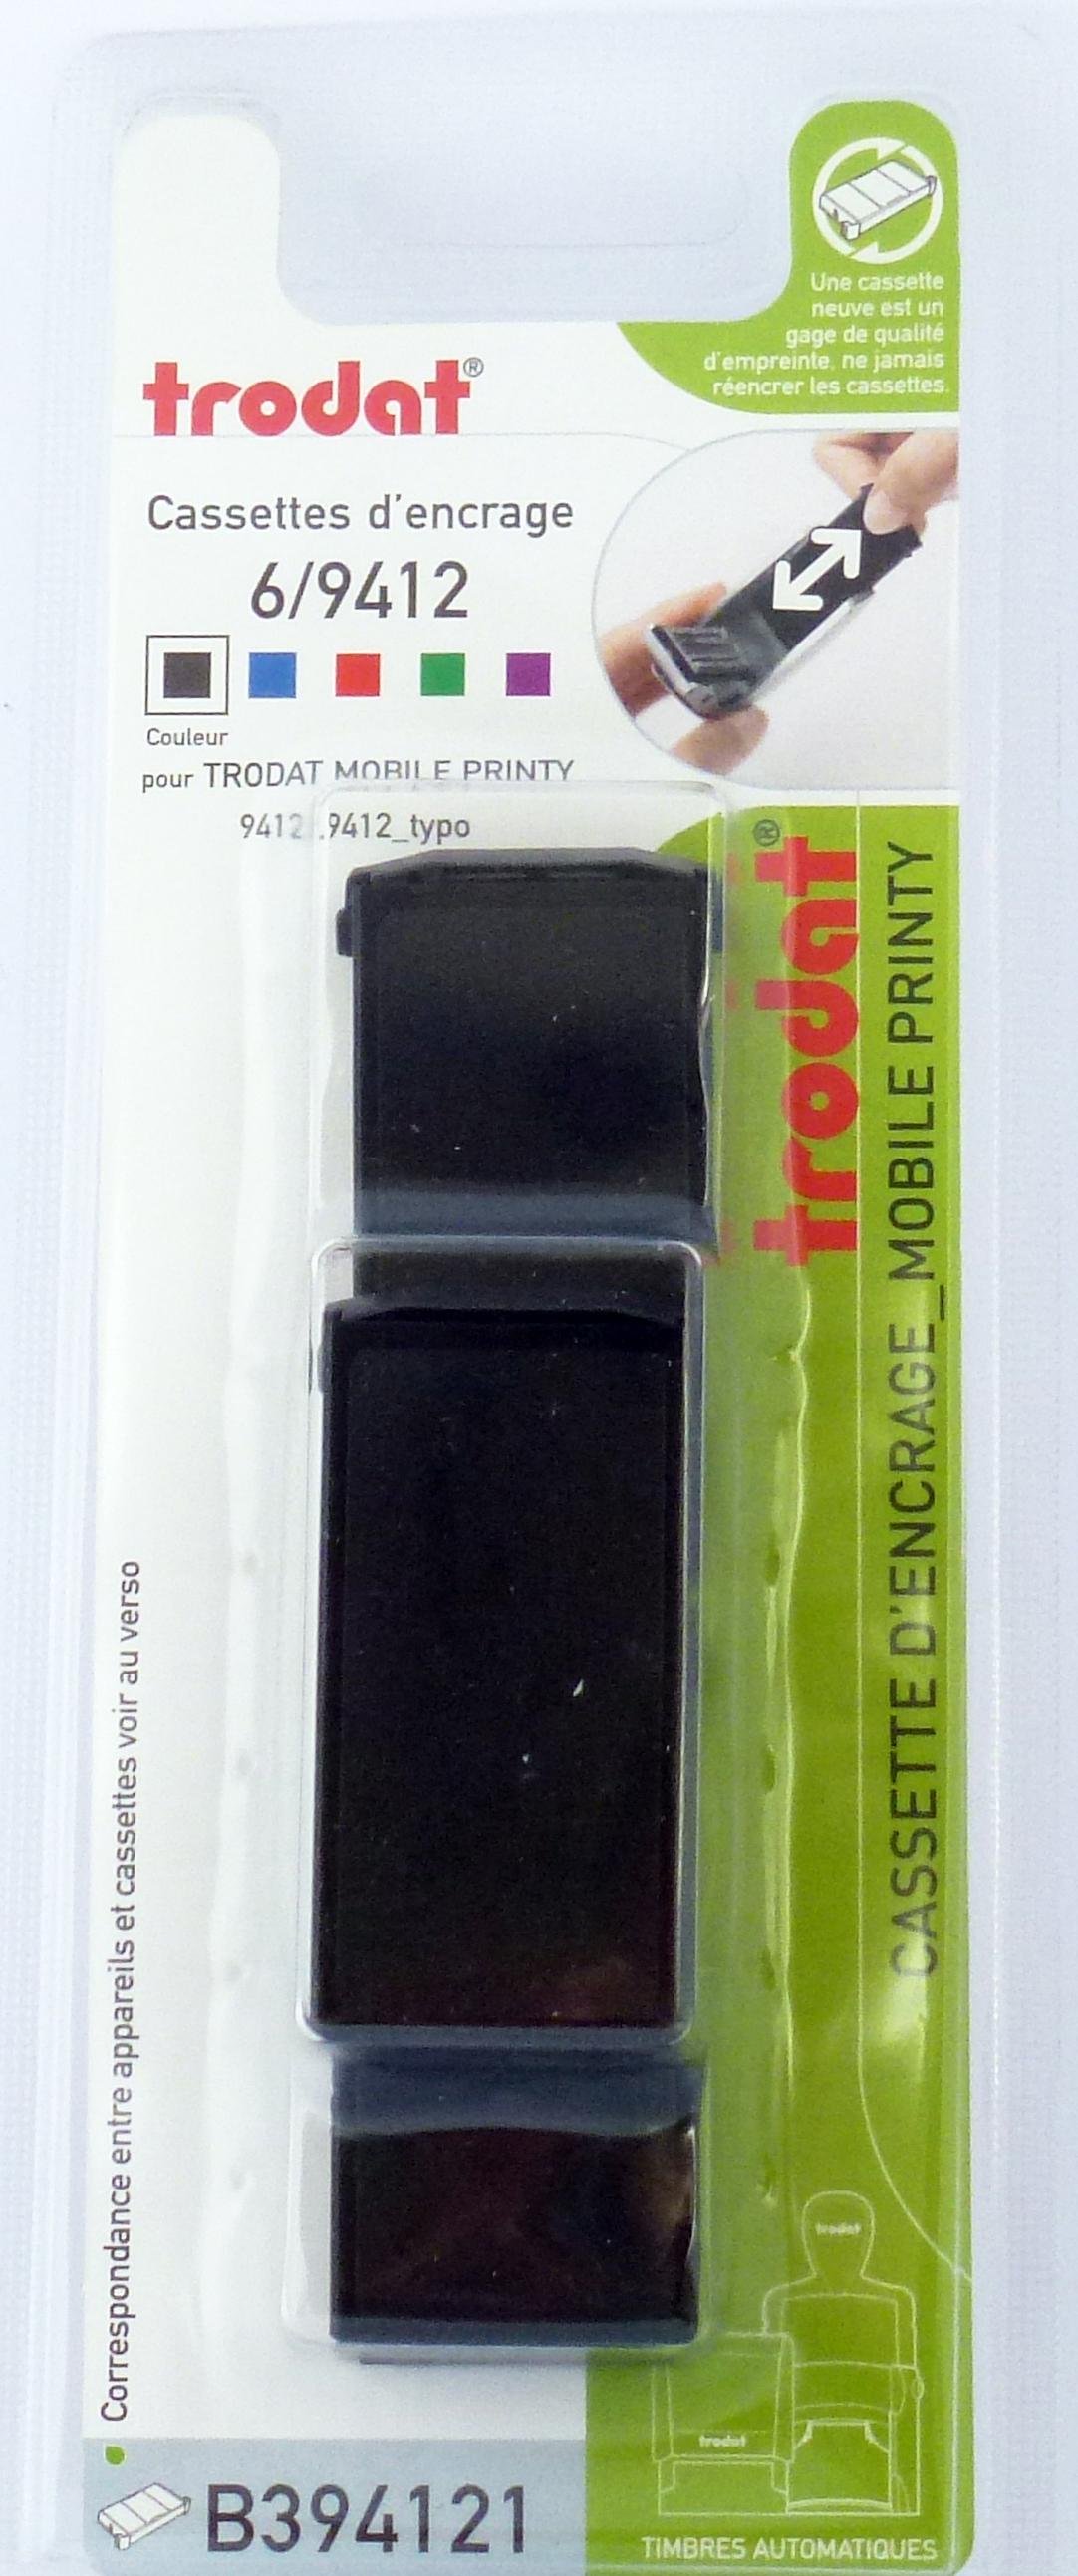 Trodat - 3 Encriers 6/9412 recharges pour tampon Mobile Printy 9412 - noir